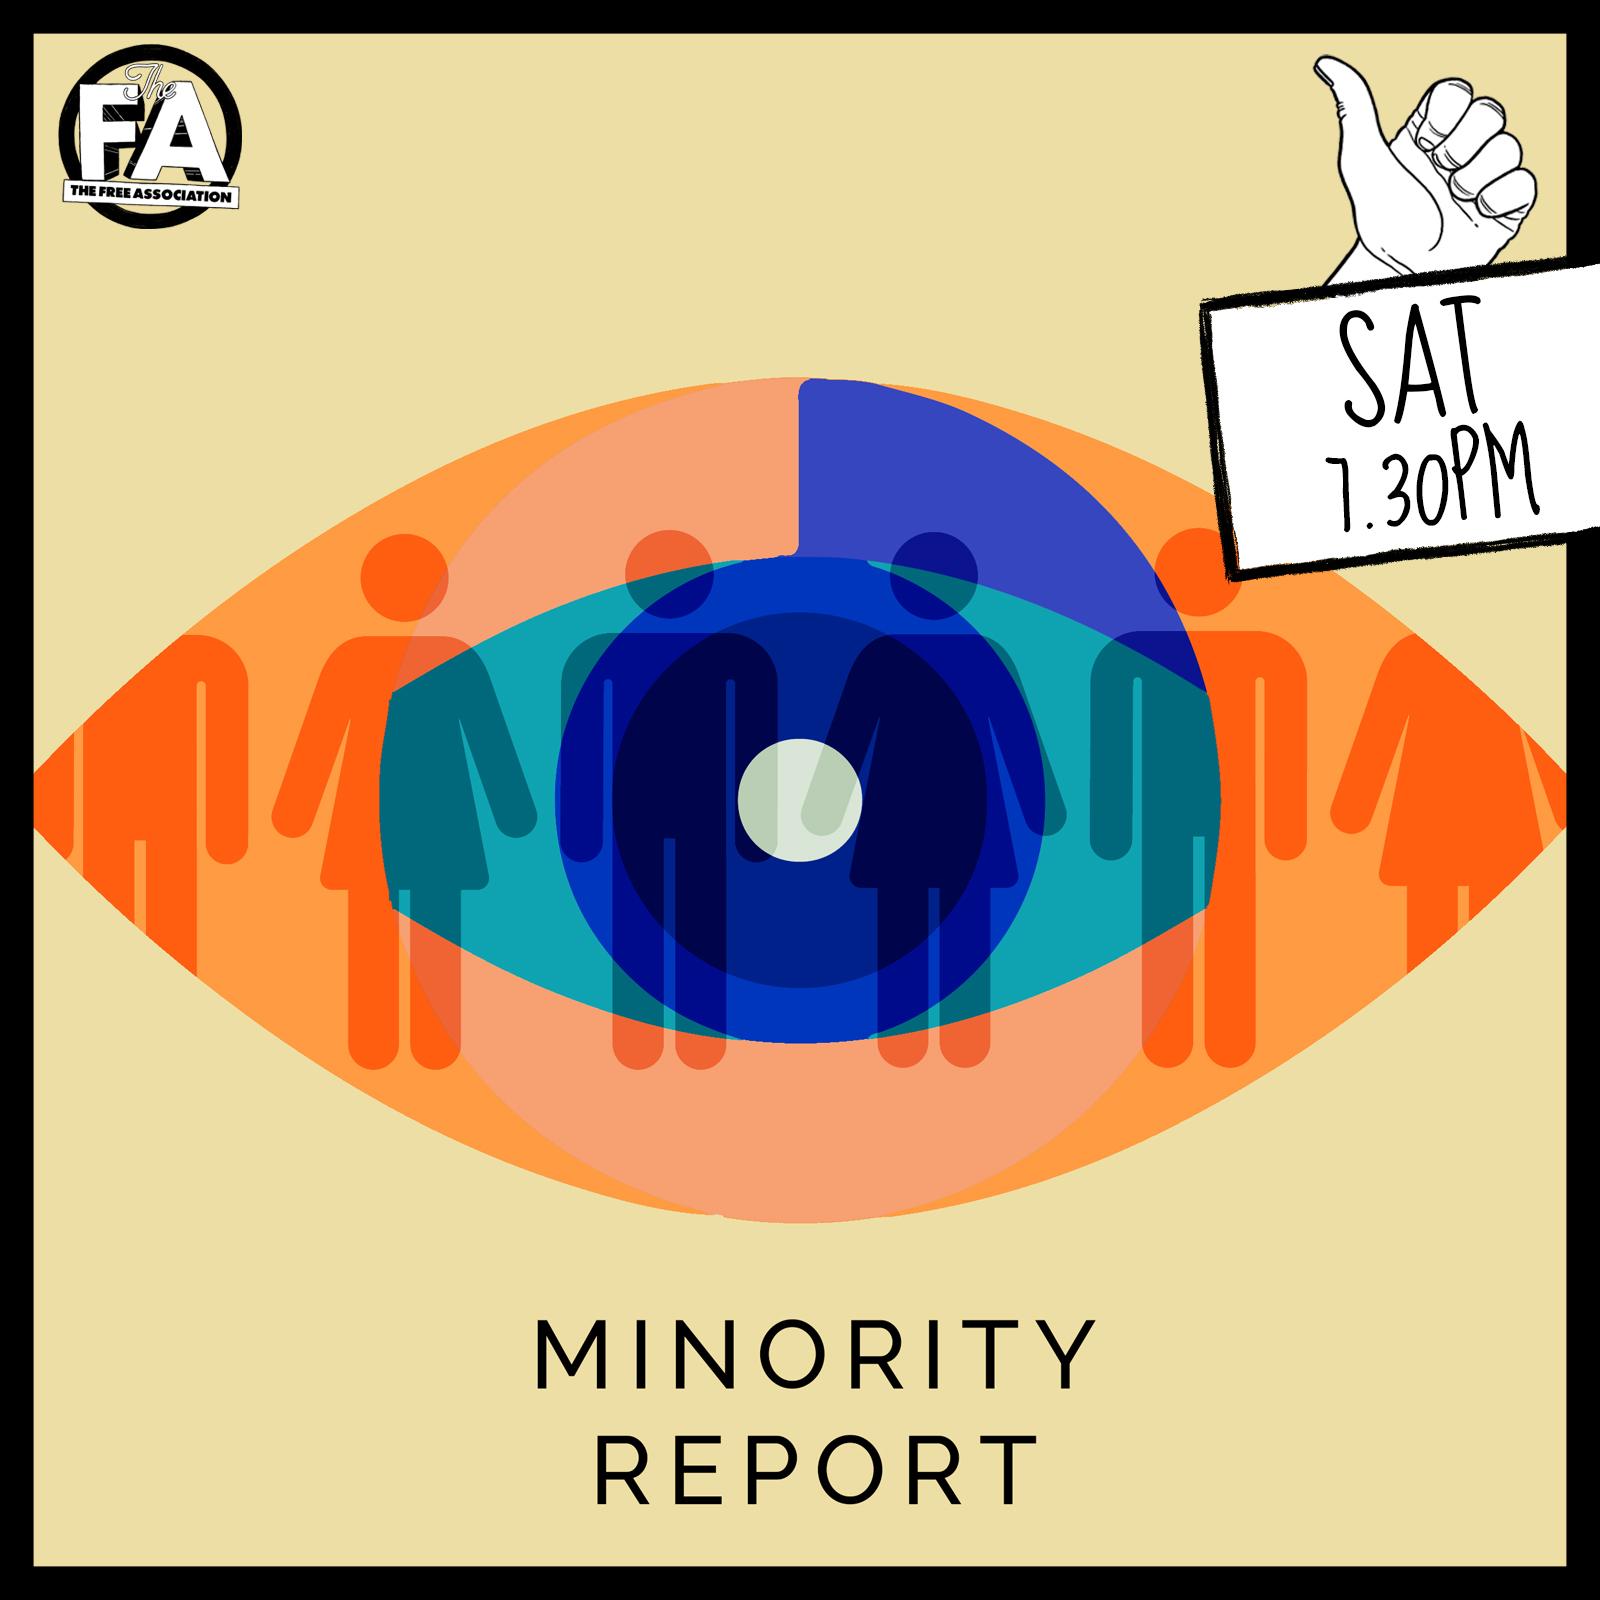 Minority Report SAT 730.jpg